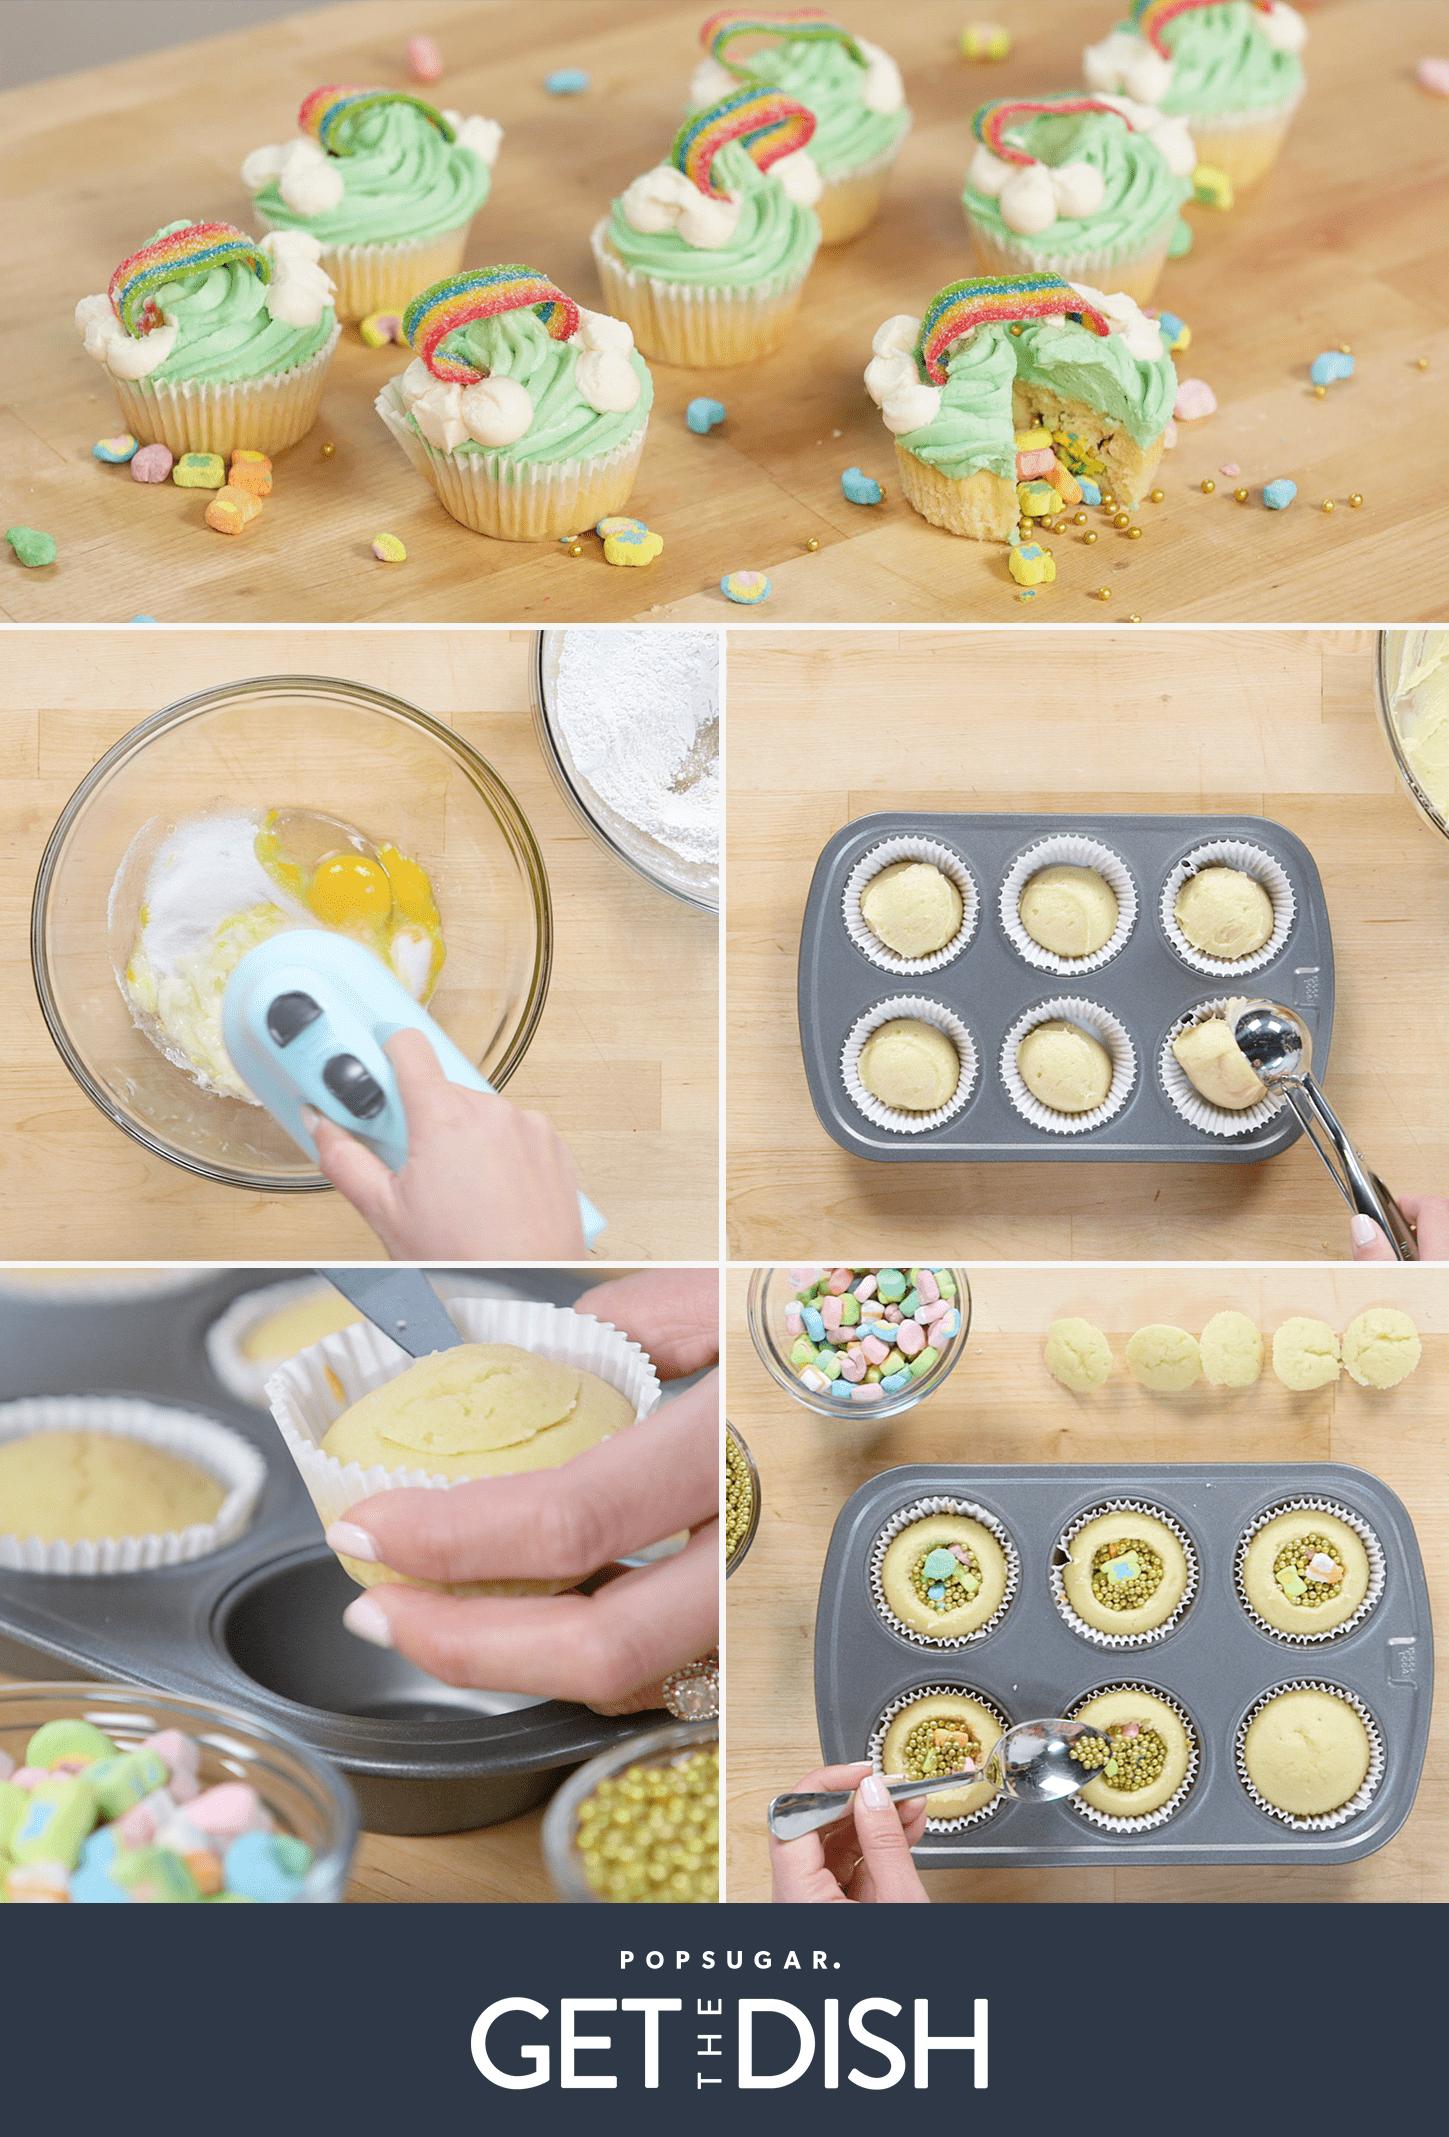 Foldaway Tote - cupcake green by VIDA VIDA 7aJvn8k